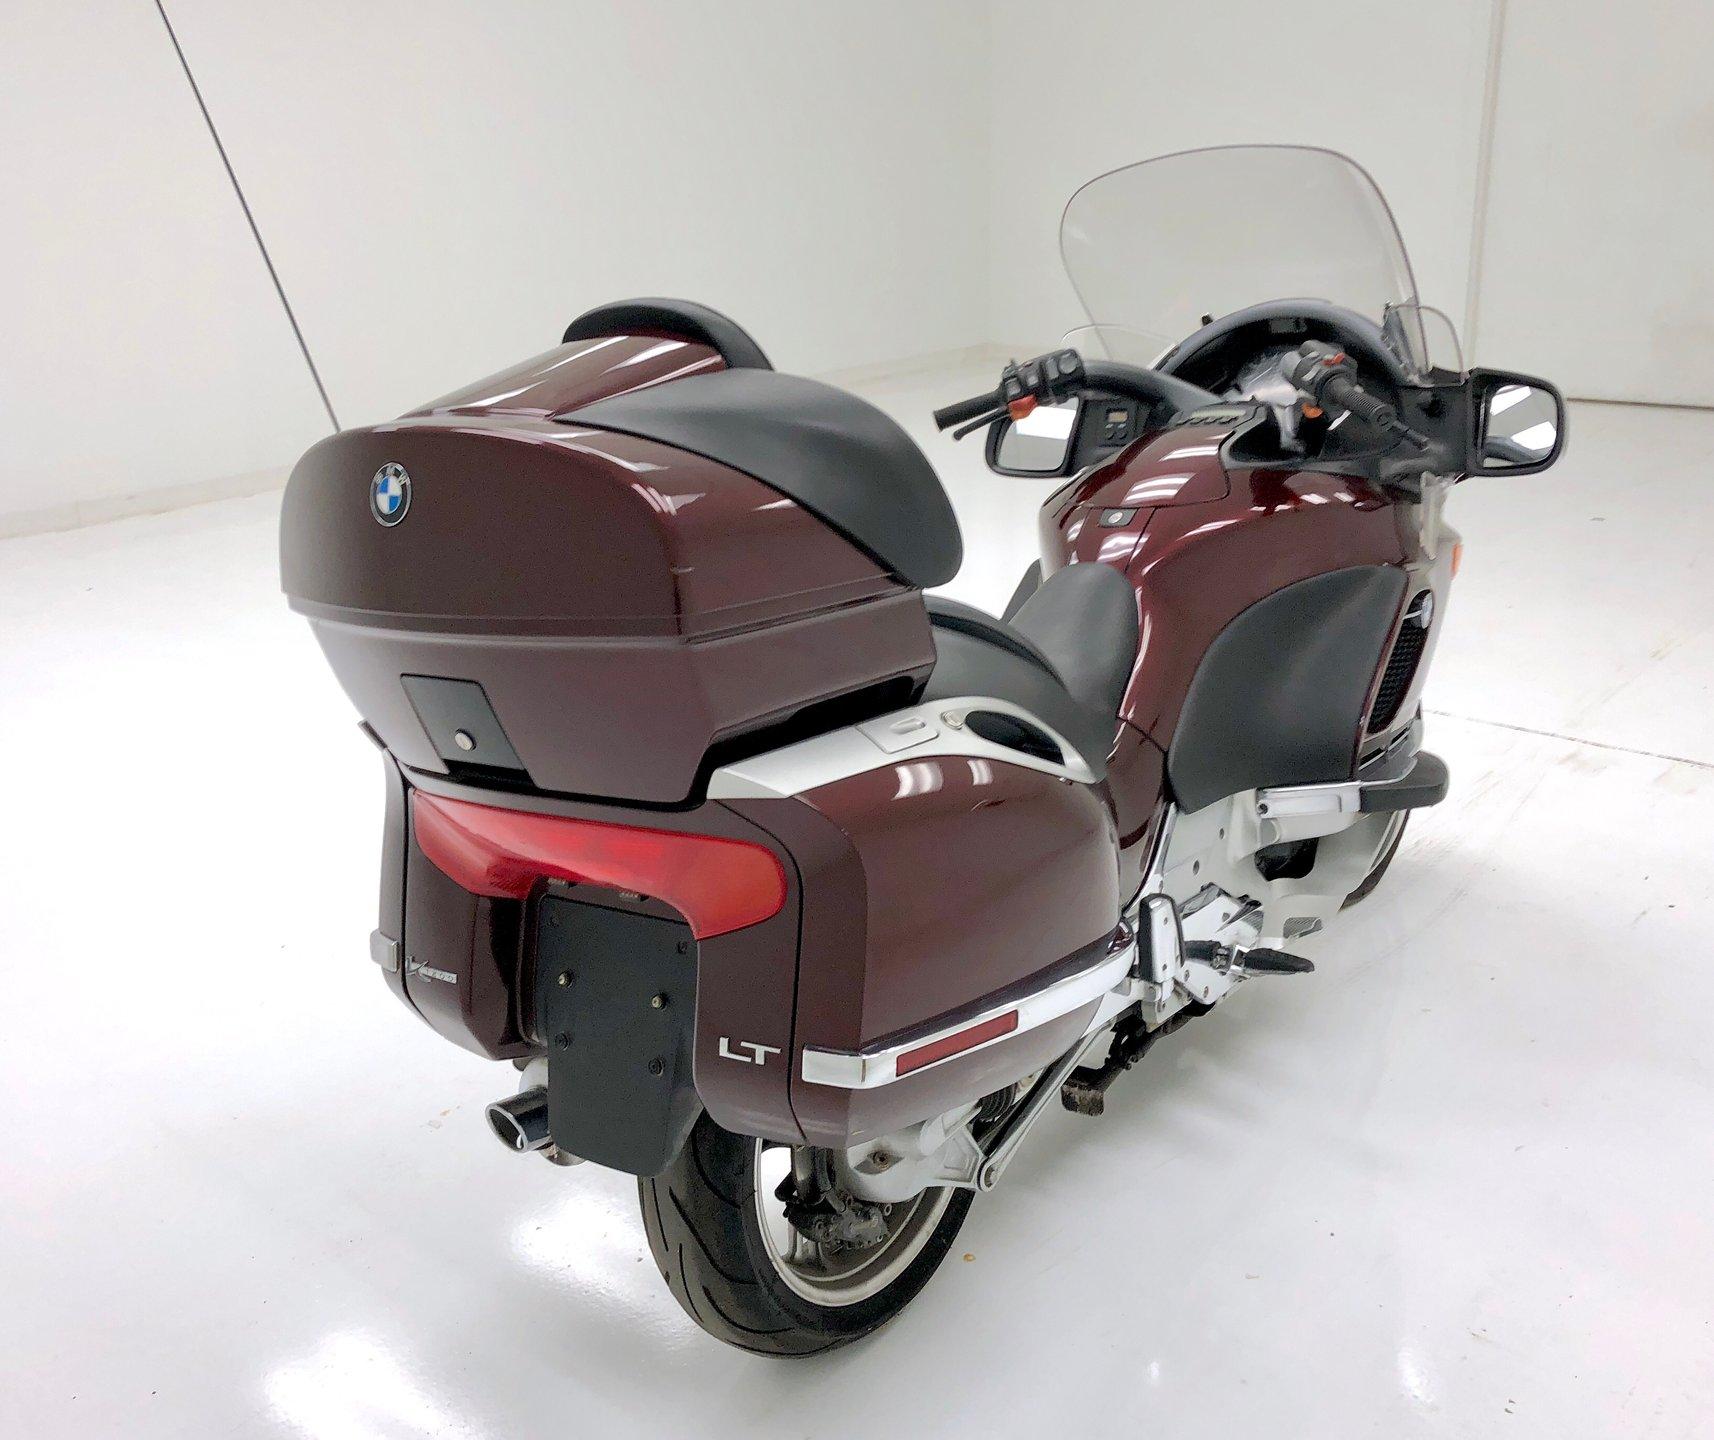 2000 BMW K1200 LT for sale #5264   Motorious